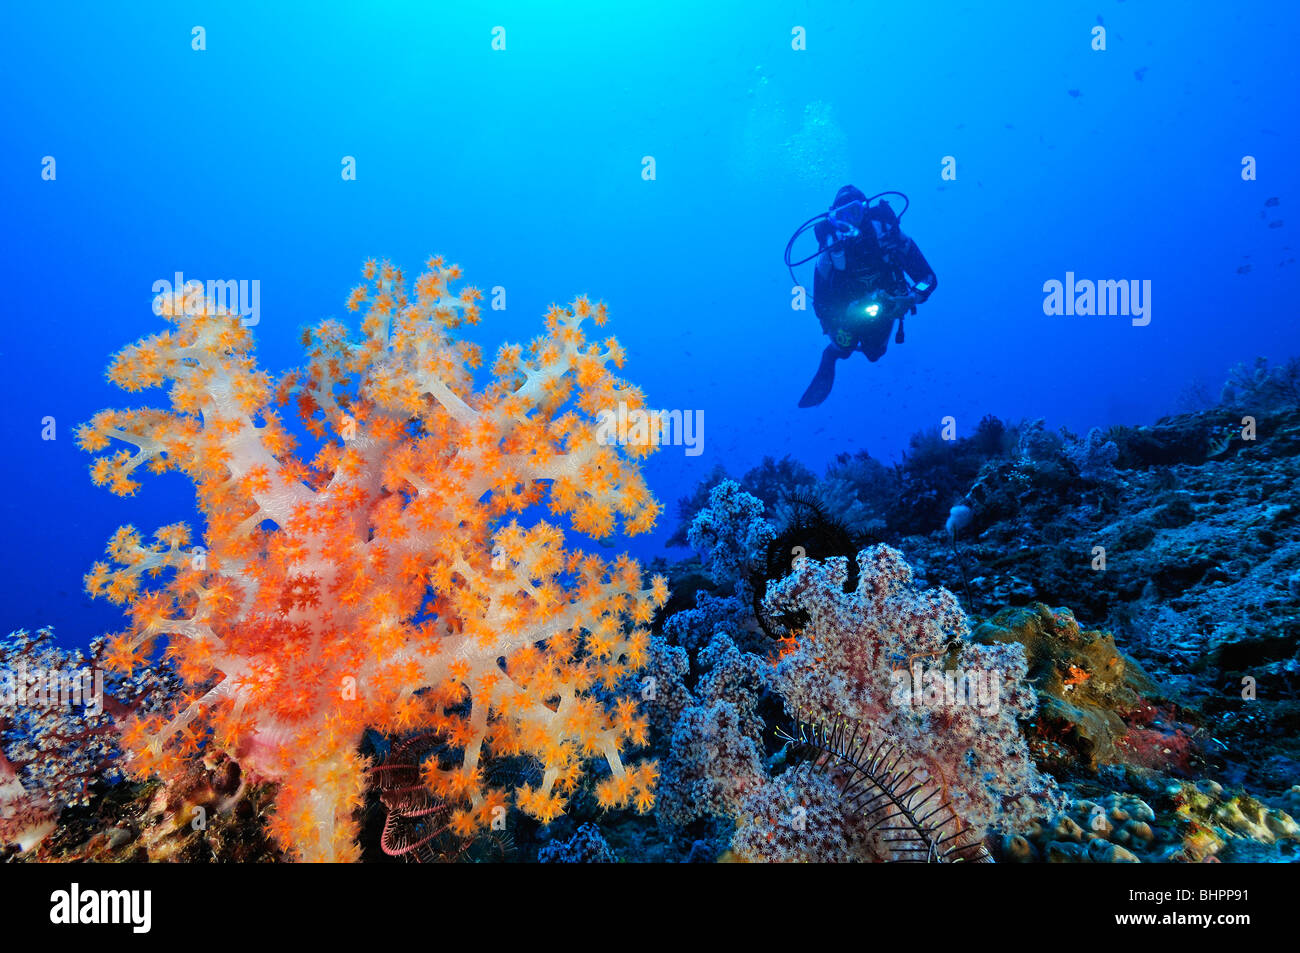 Dendronephthya klunzingeri, scuba diver and colorful coral reef, soft corals and barrel sponge, Jemeluk, Cemeluk, - Stock Image